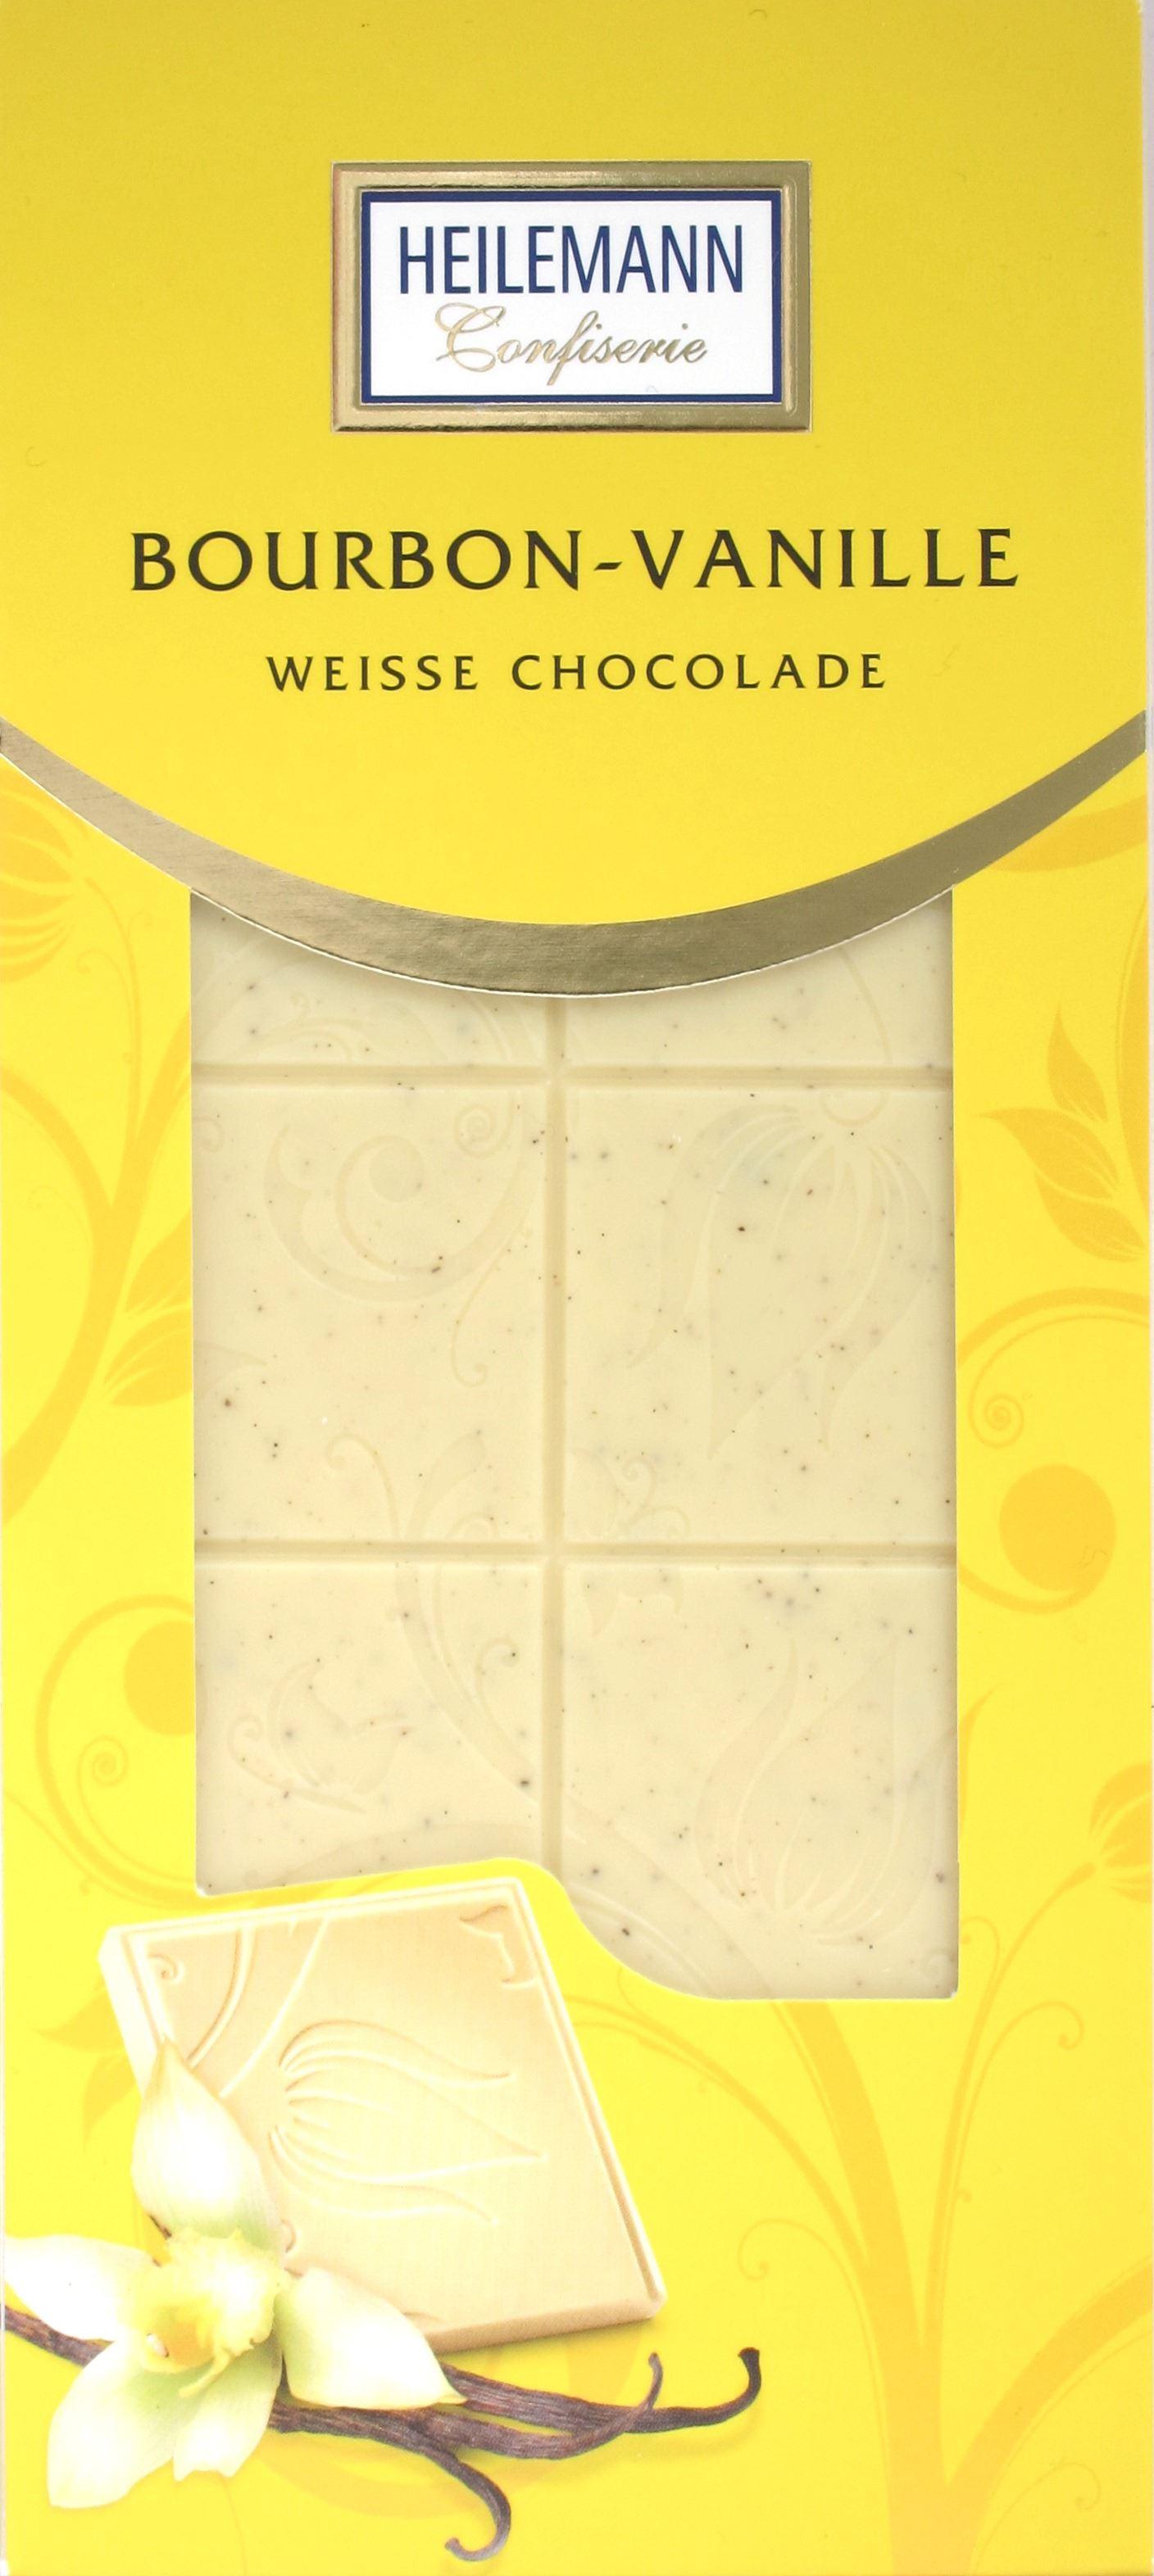 Confiserie Heilemann: Weiße Schokoladen-Tafel